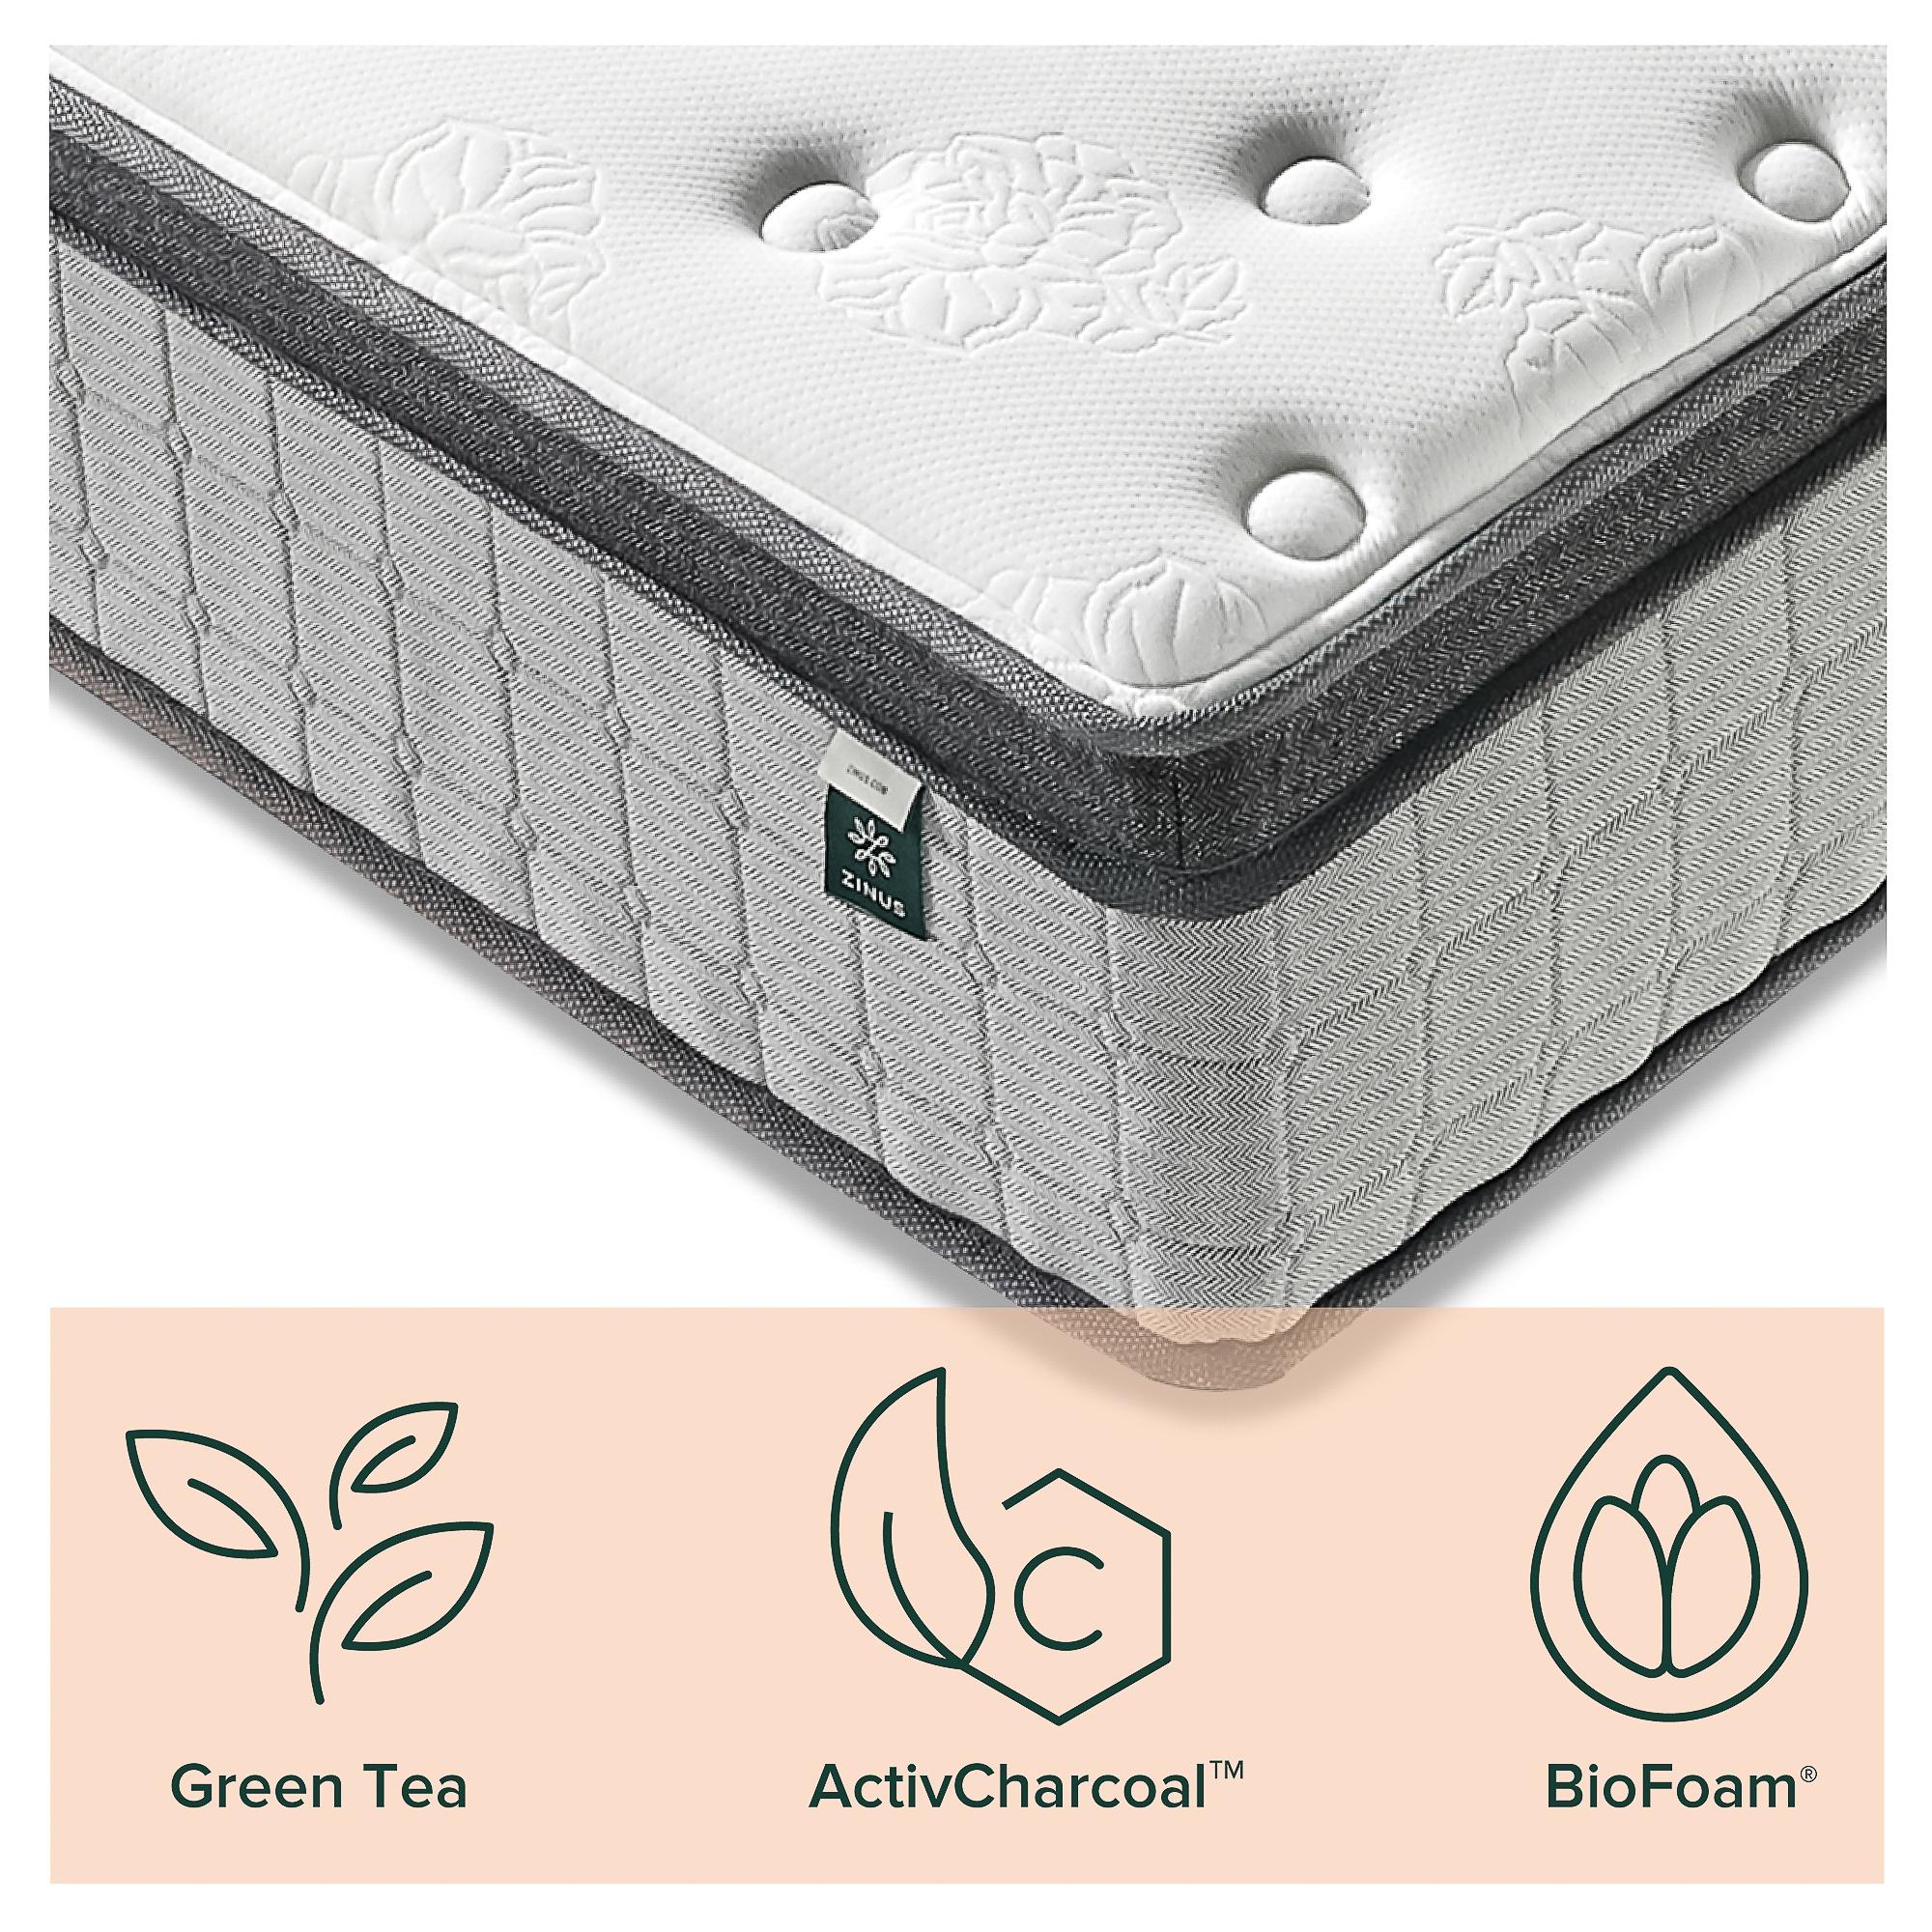 thumbnail 48 - Zinus Mattress Queen Double King Single Bed Memory Foam Pocket Spring Hybrid